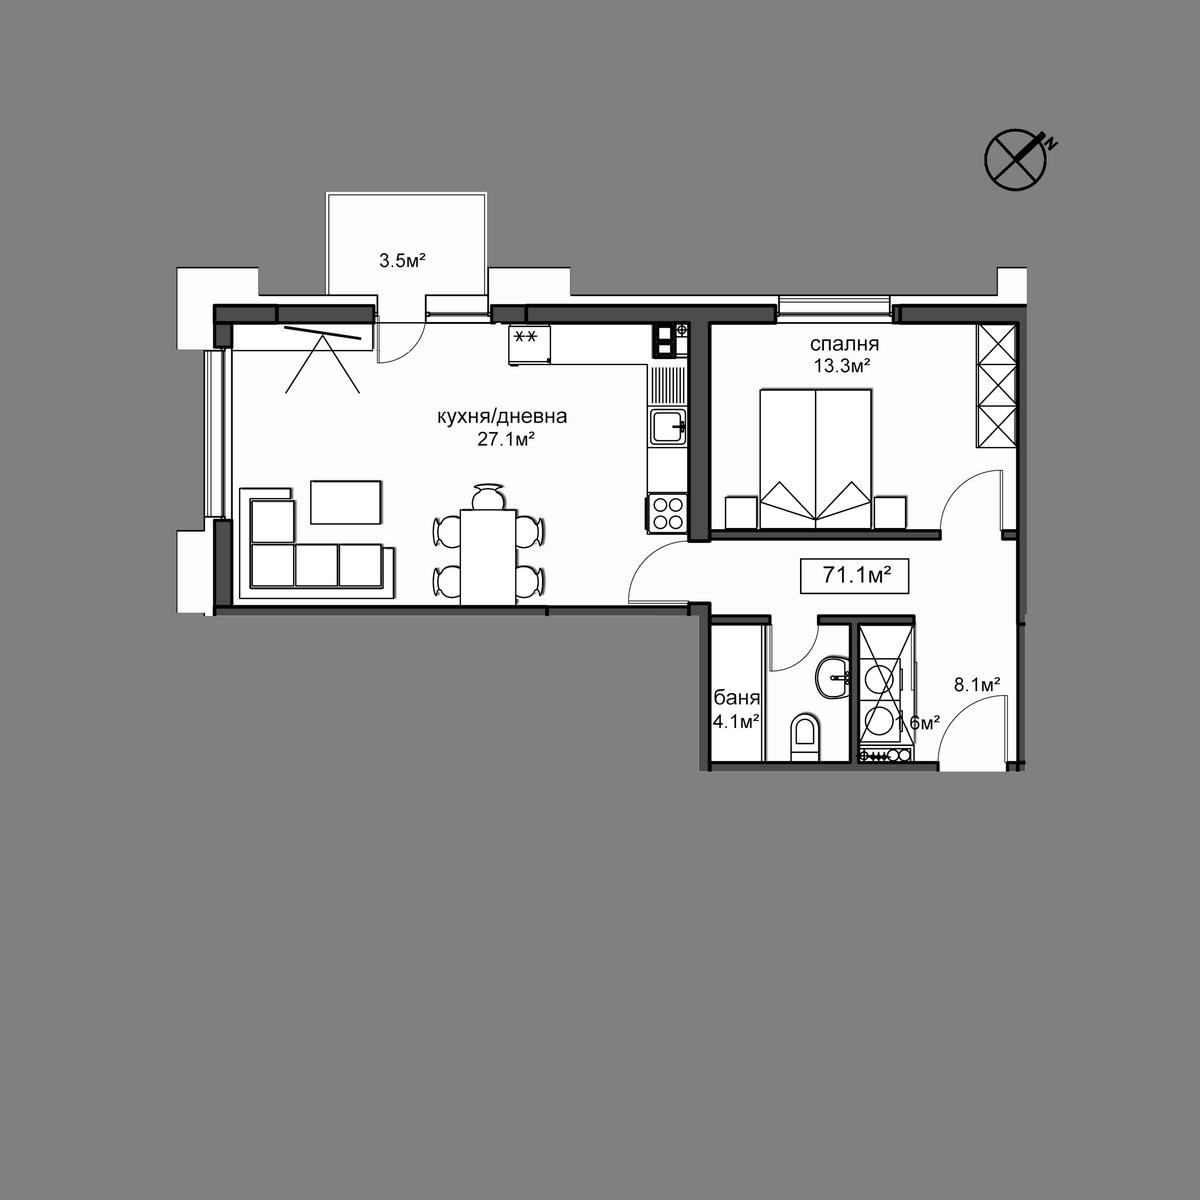 Продава апартамент - Апартамент 1